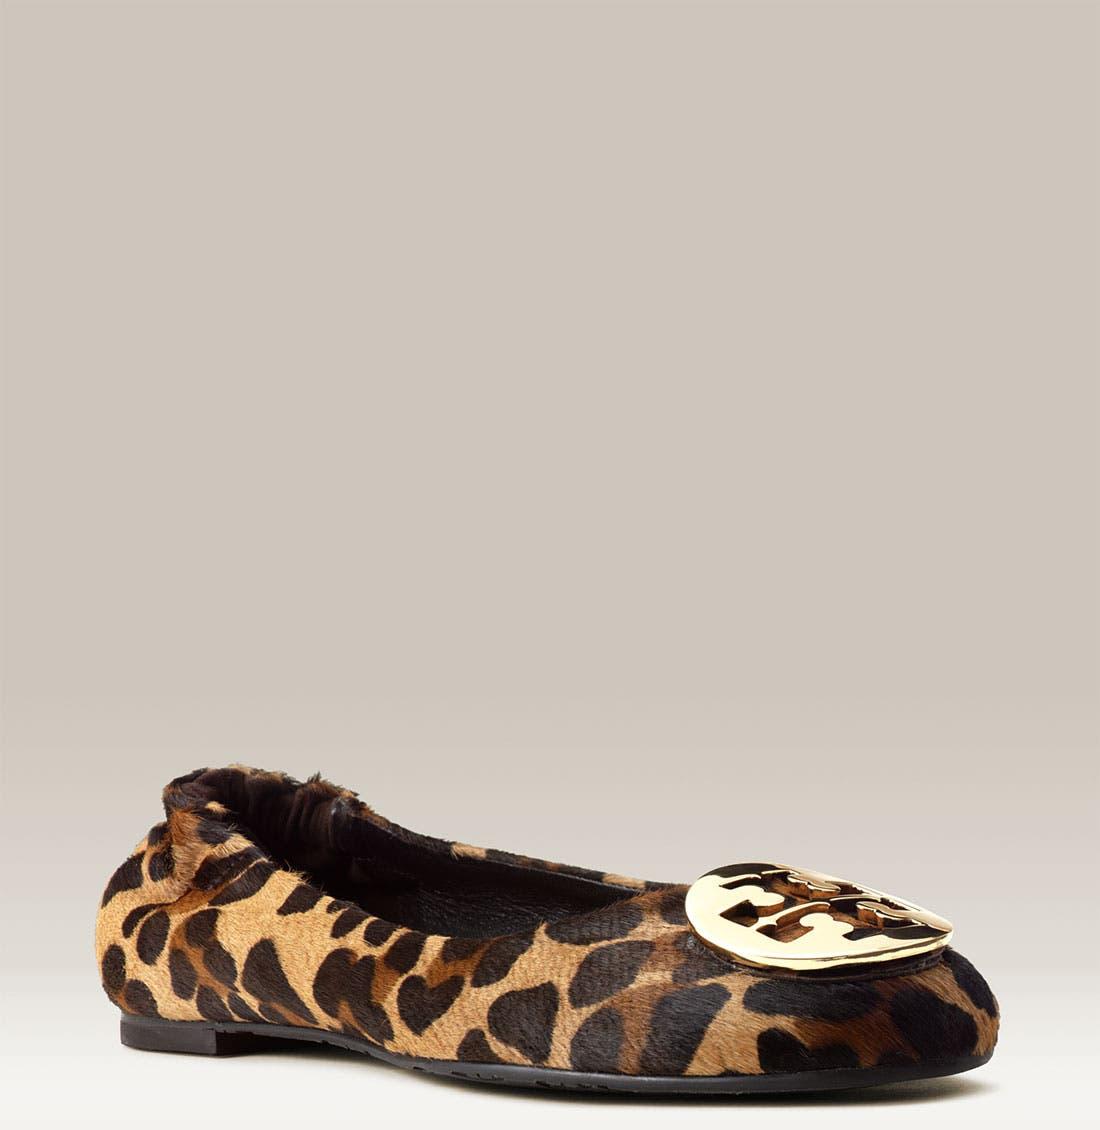 Main Image - Tory Burch 'Reva' Leopard Ballerina Flat